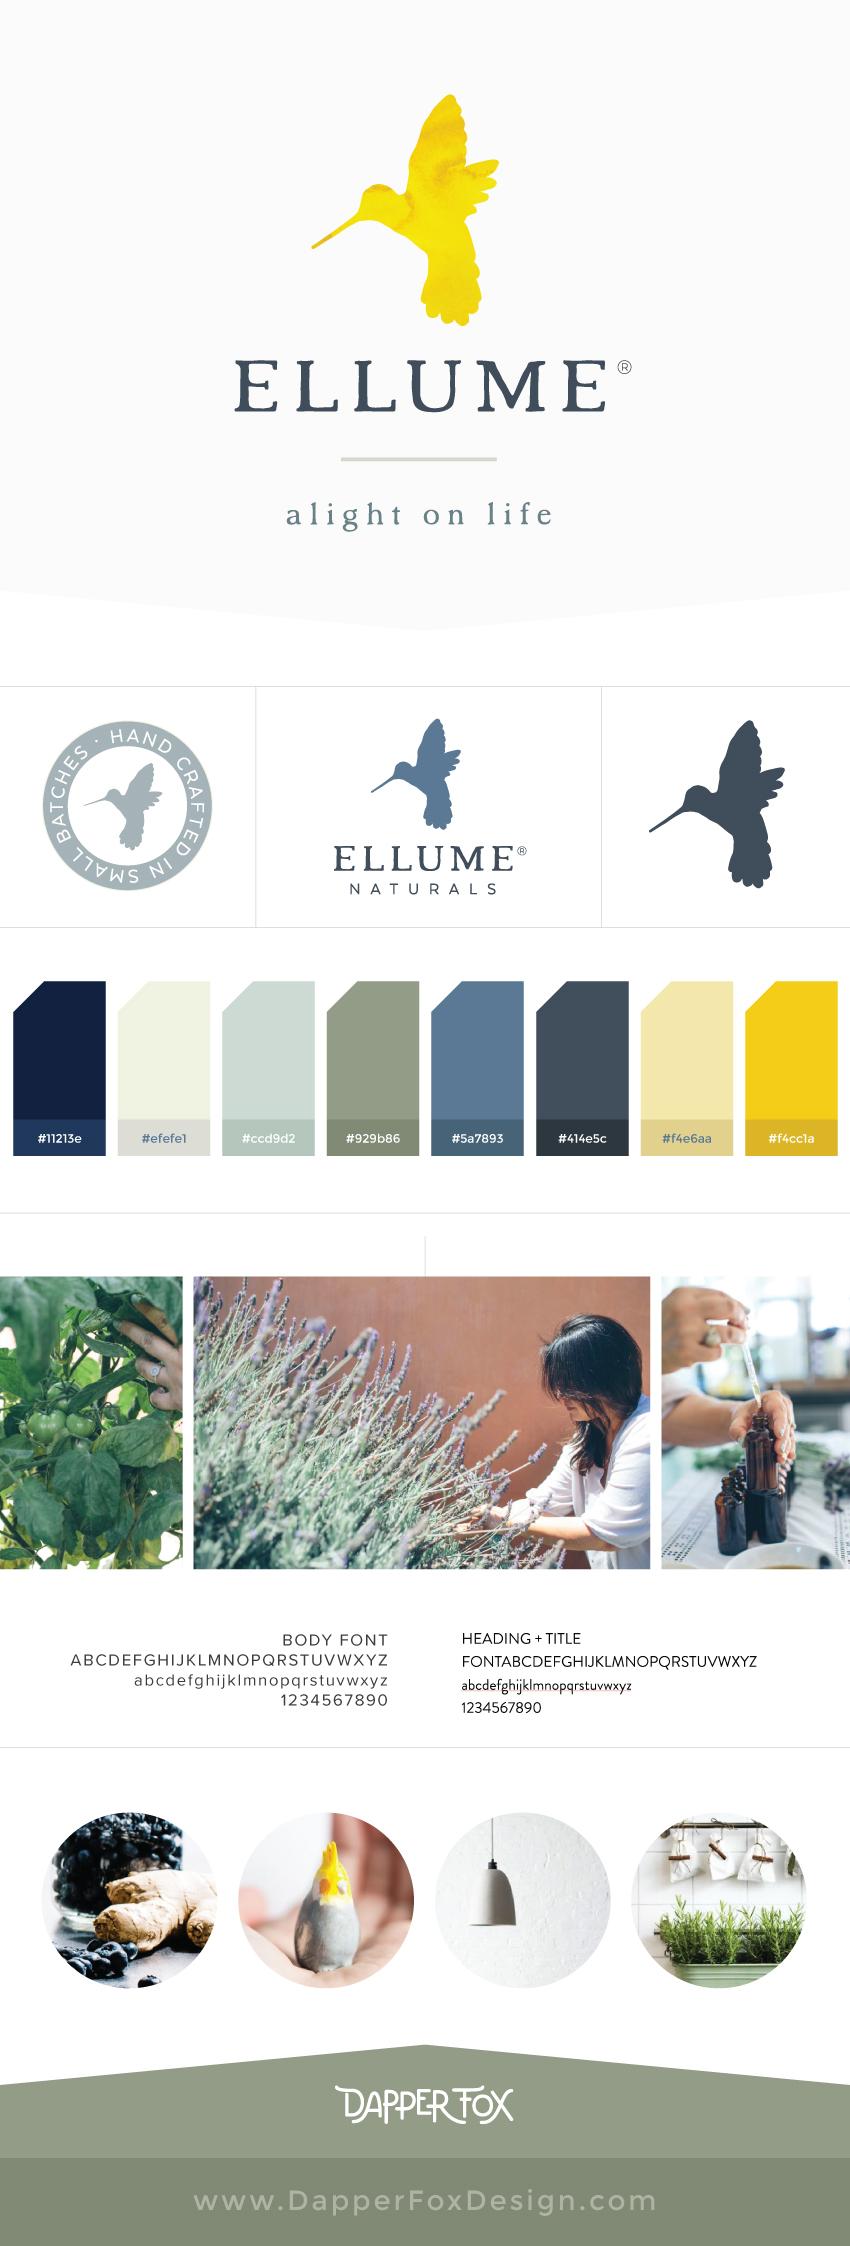 Ellume Eco Friendly Logo Design and Brand Board by Dapper Fox Design #minimal #modernlogo #bird #logo #watercolorlogo #anthropologic  #artlogo #logodesign #moodboard #yellow #blue #fresh